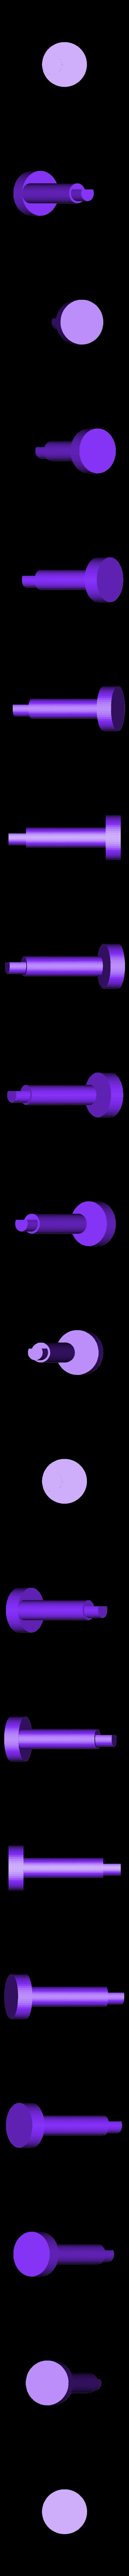 Crank2.stl Télécharger fichier STL gratuit Châssis du robot Walker • Design à imprimer en 3D, SiberK